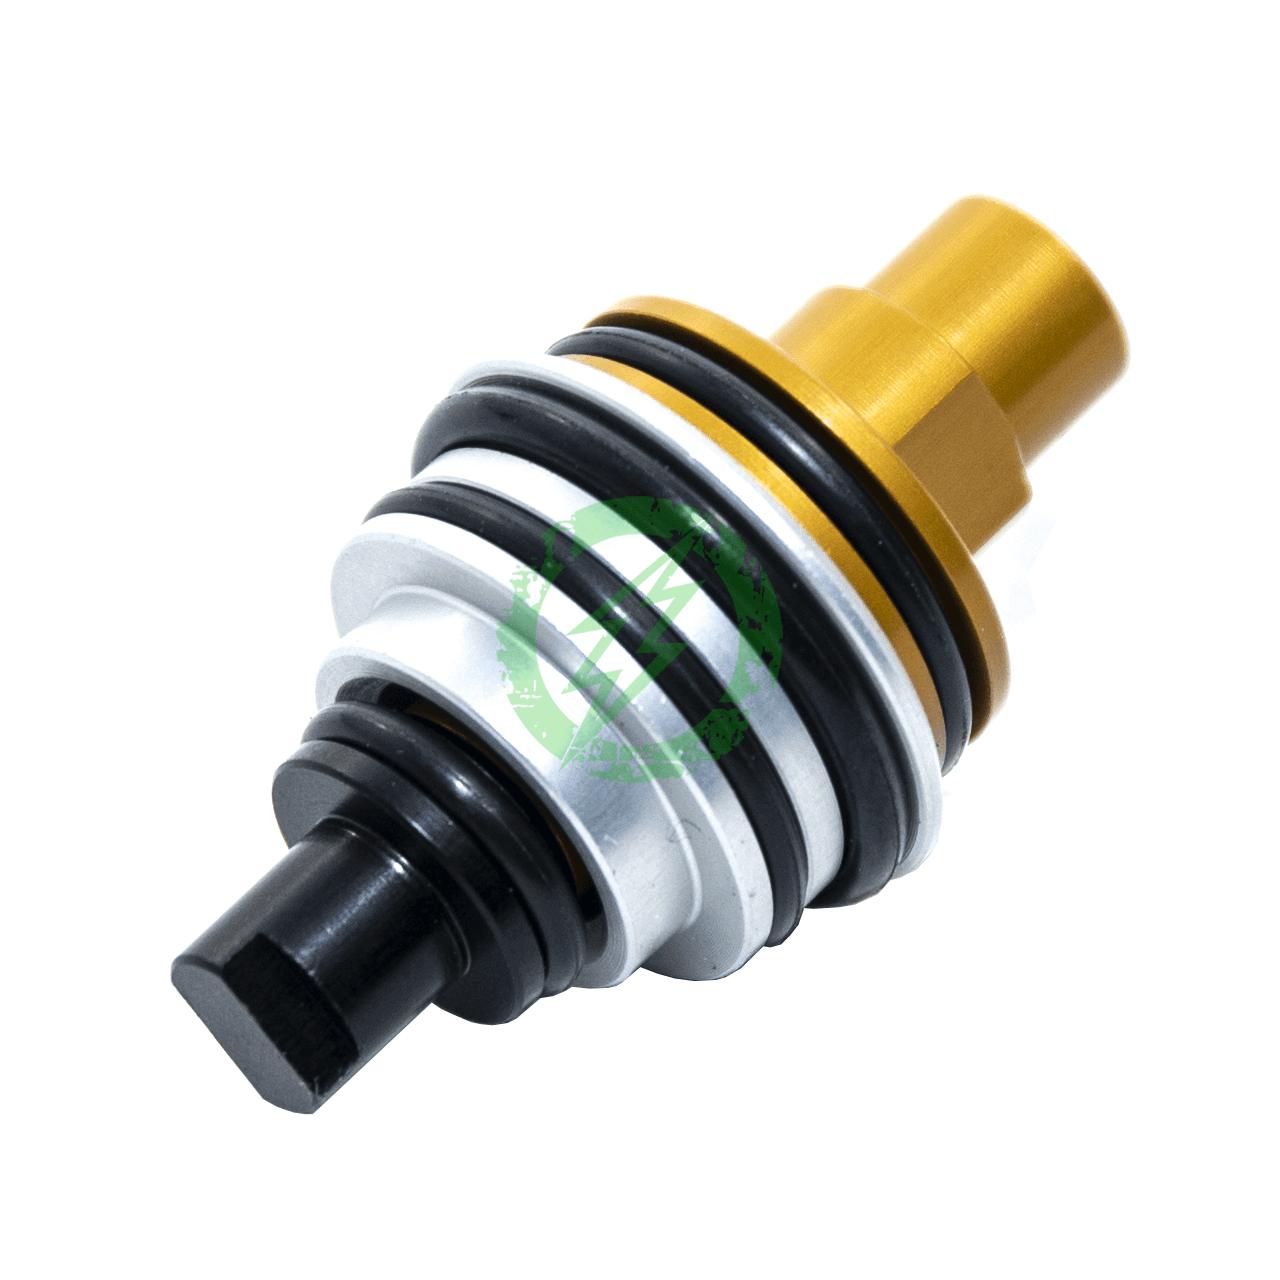 PolarStar Fusion Engine Gold Poppet | Low Flow .0465